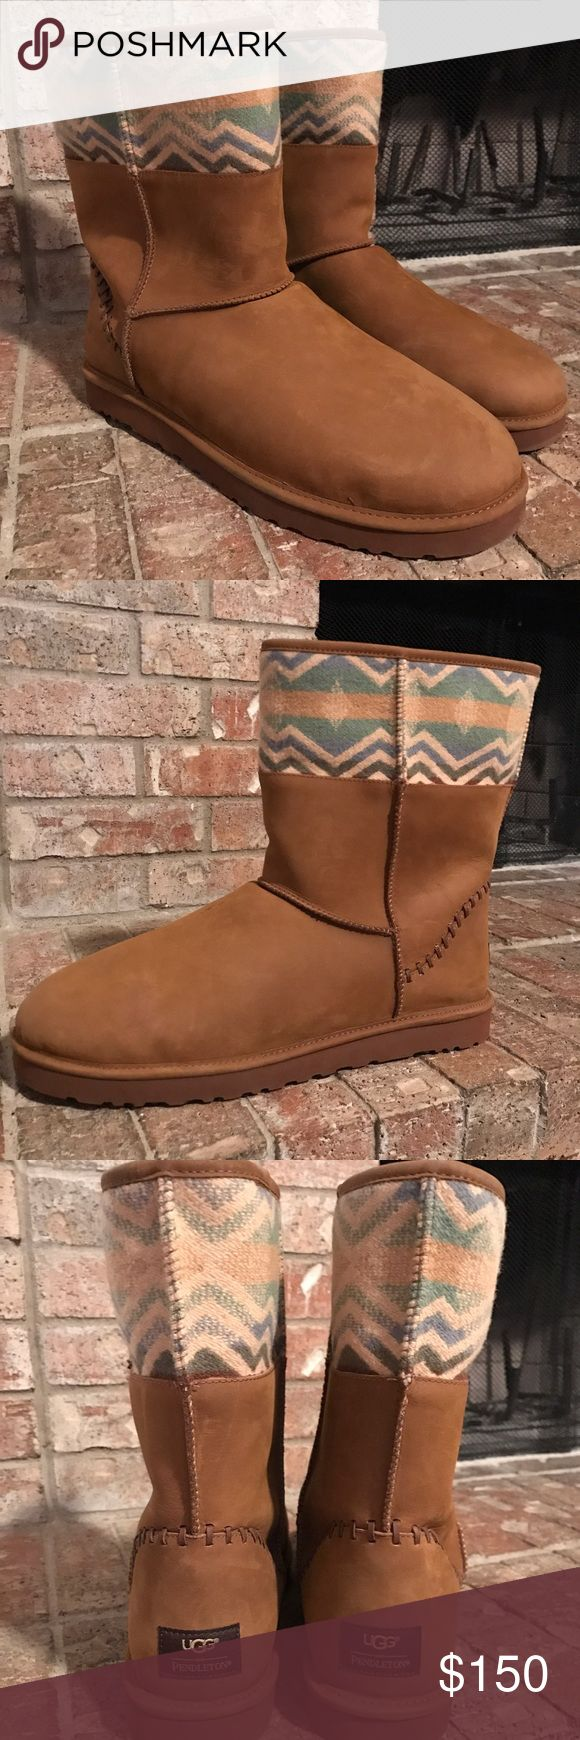 UGG AUSTRALIA PENDLETON Classic Short Deco Ltd. New without a box. UGG AUSTRALIA PENDLETON Classic Short Deco Ltd. Brown Boots Mens size 18. UGG Shoes Winter & Rain Boots